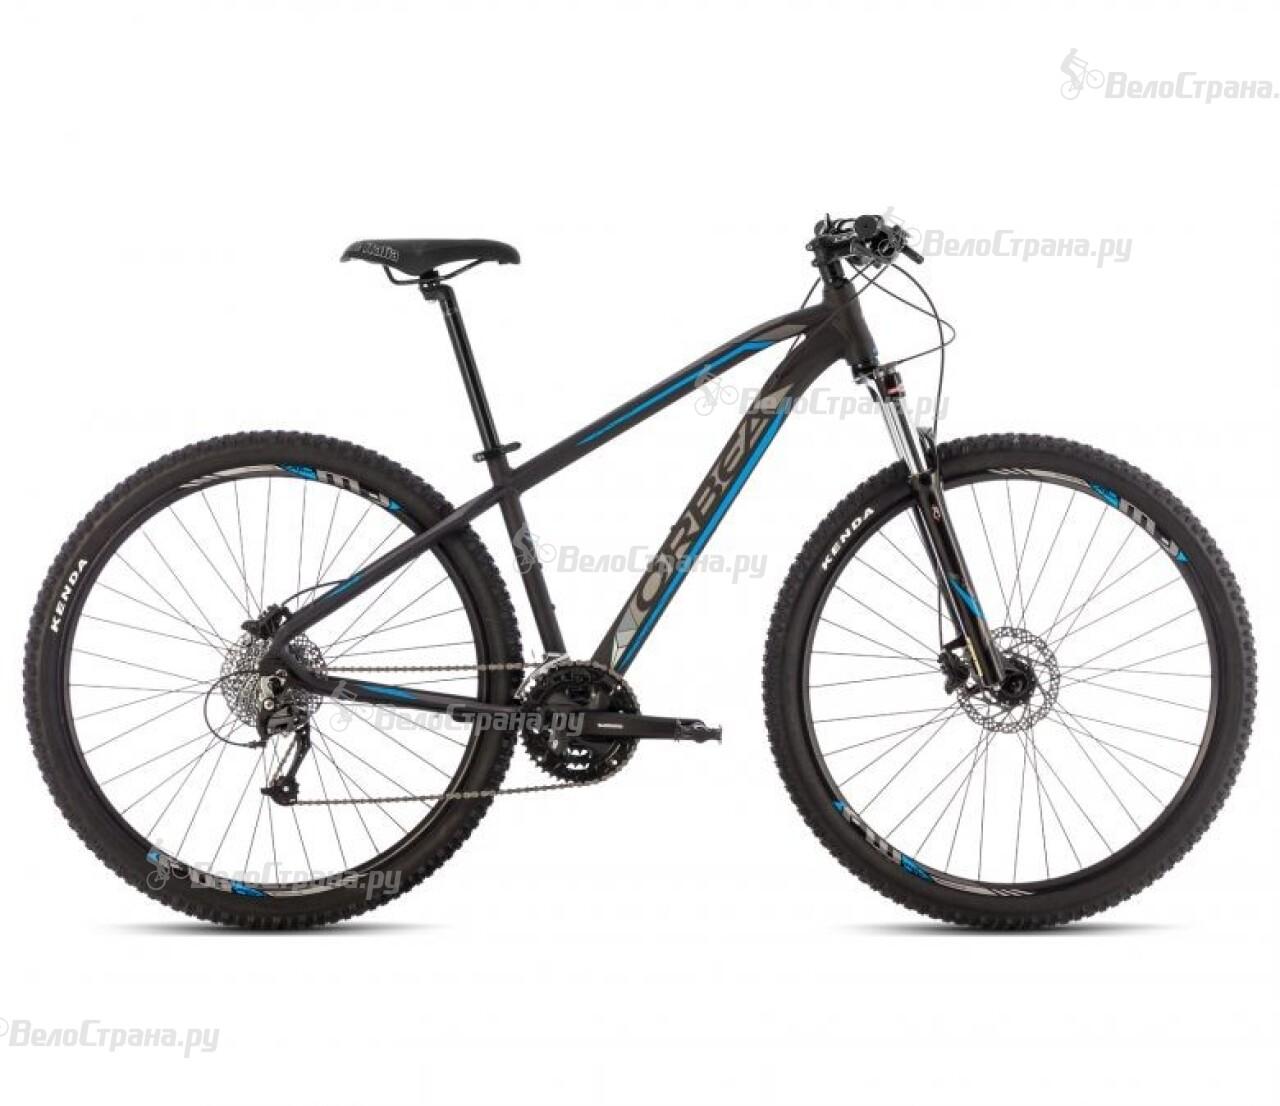 Велосипед Orbea Mx 29 20 Dama (2014) велосипед orbea mx 24 xc 2014